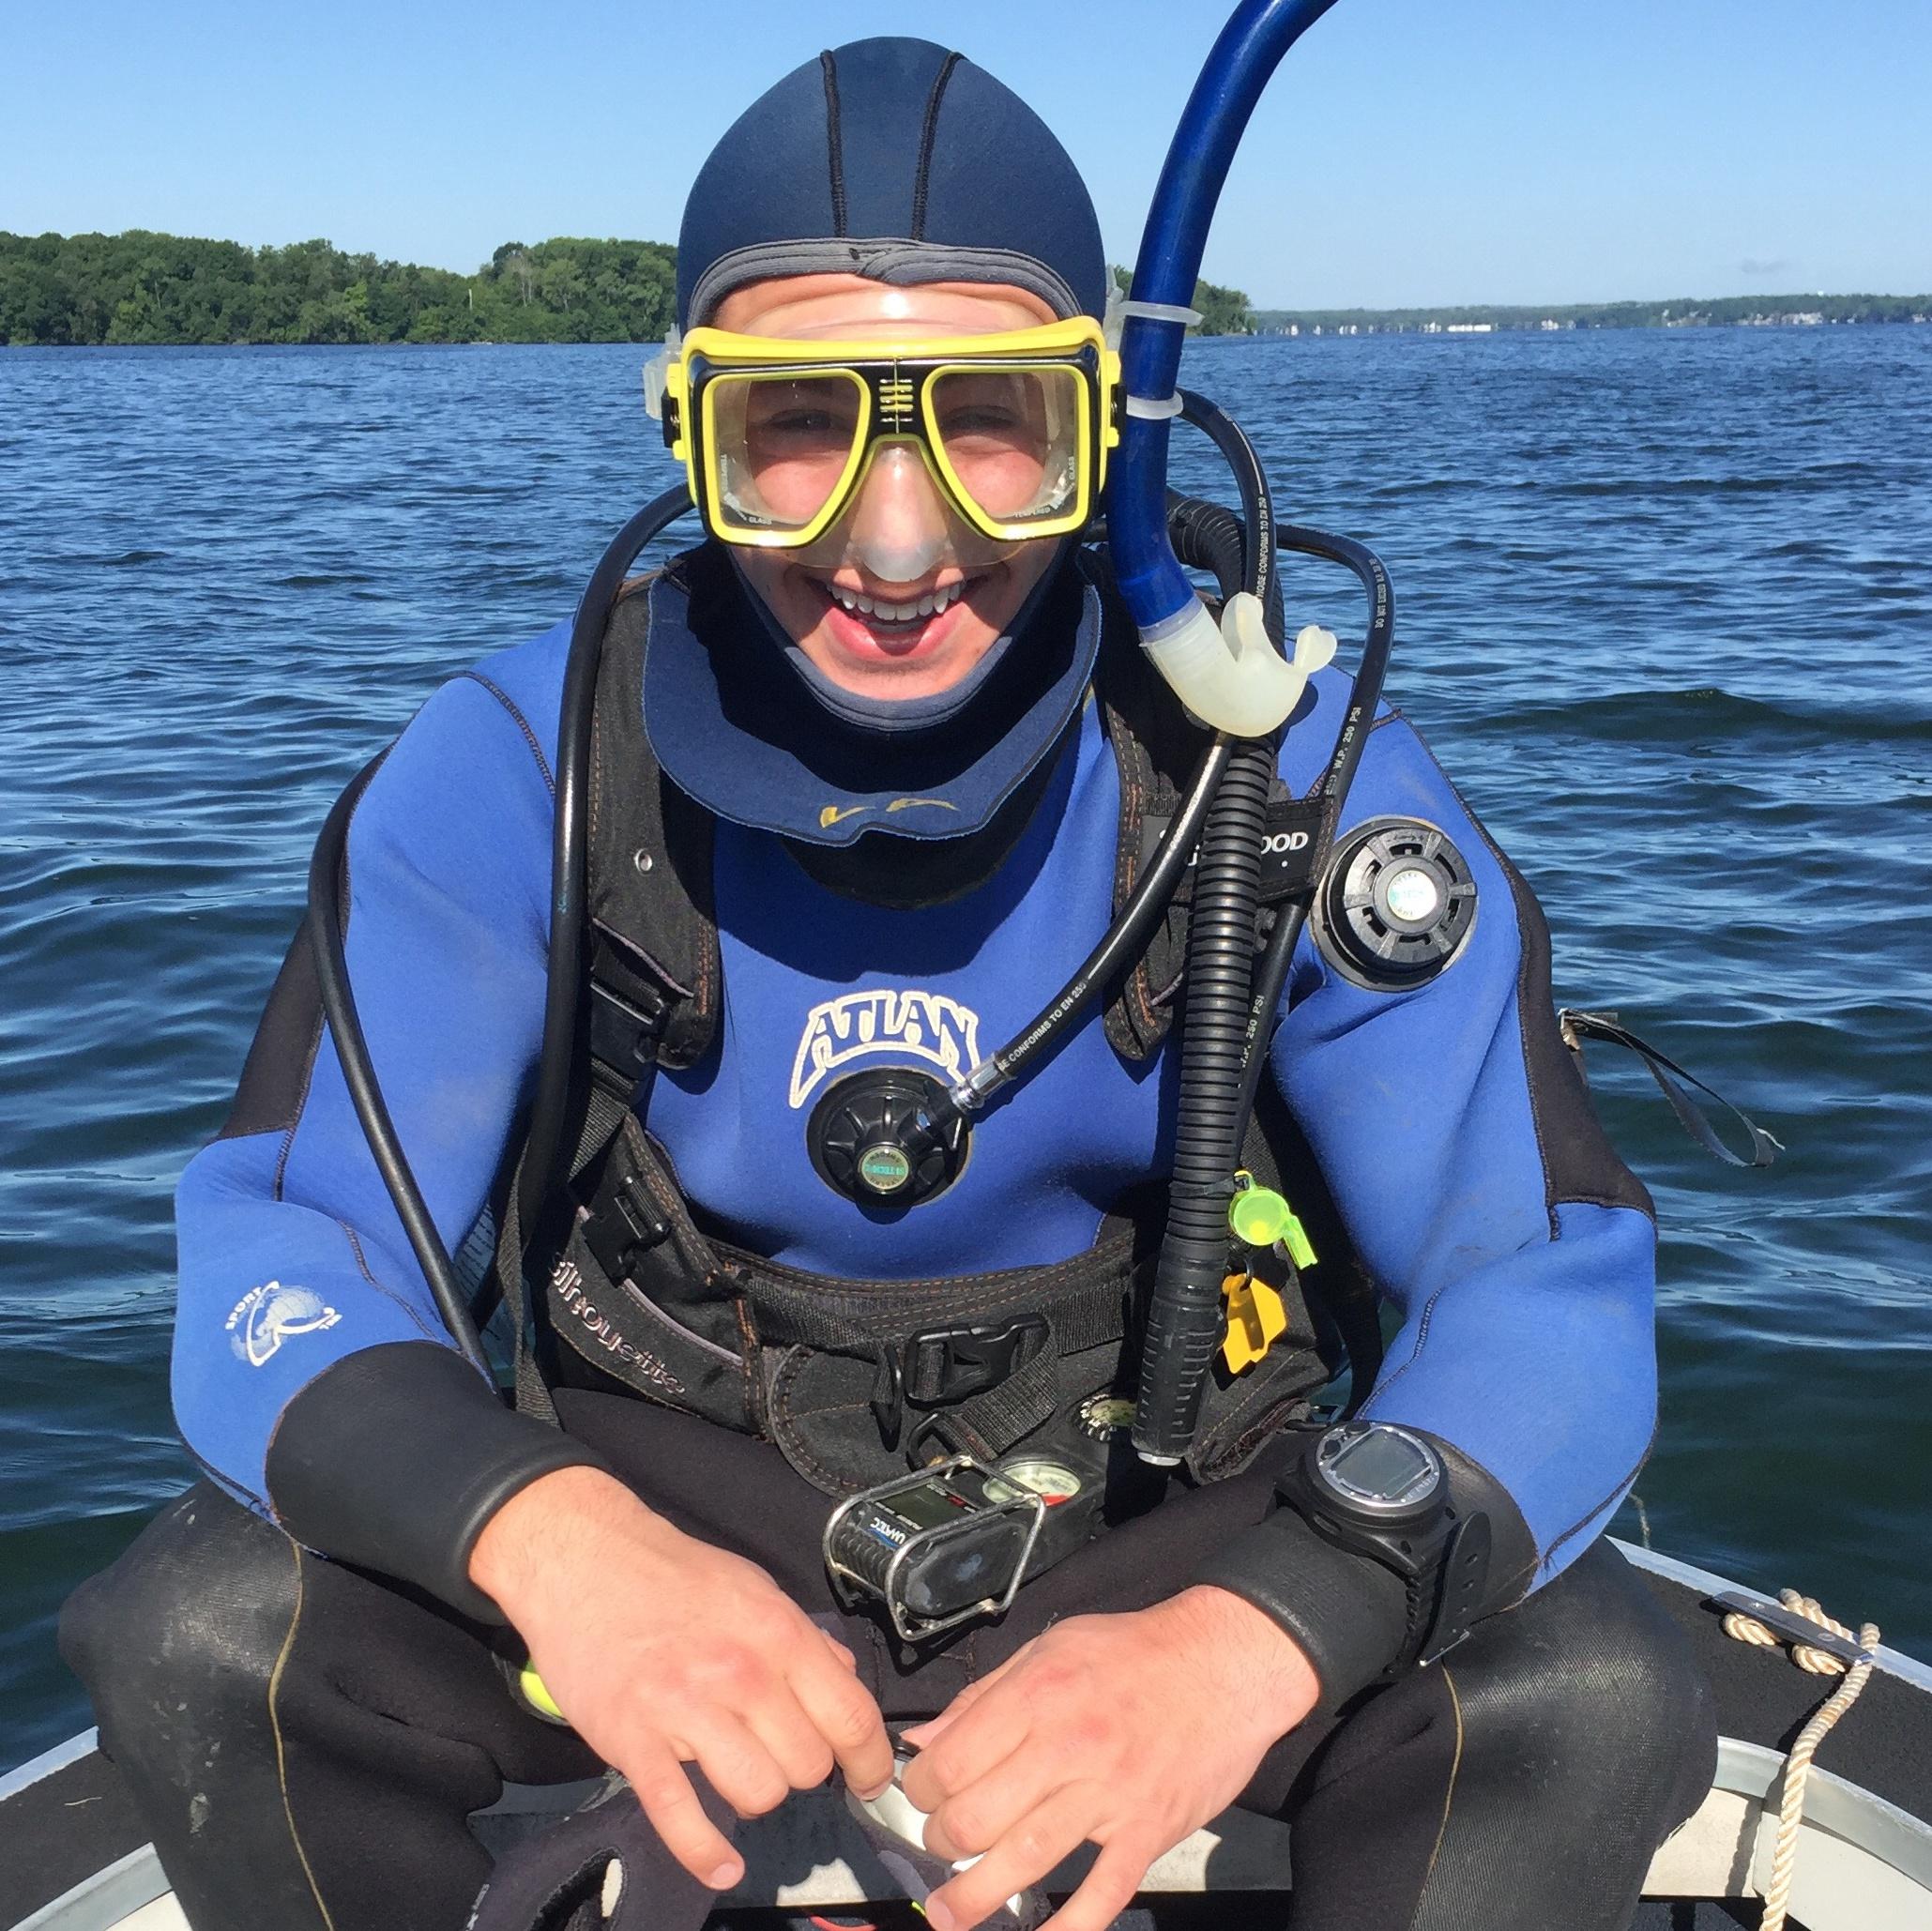 Diversions Scuba Wisconsins Premier Dive Center Located In